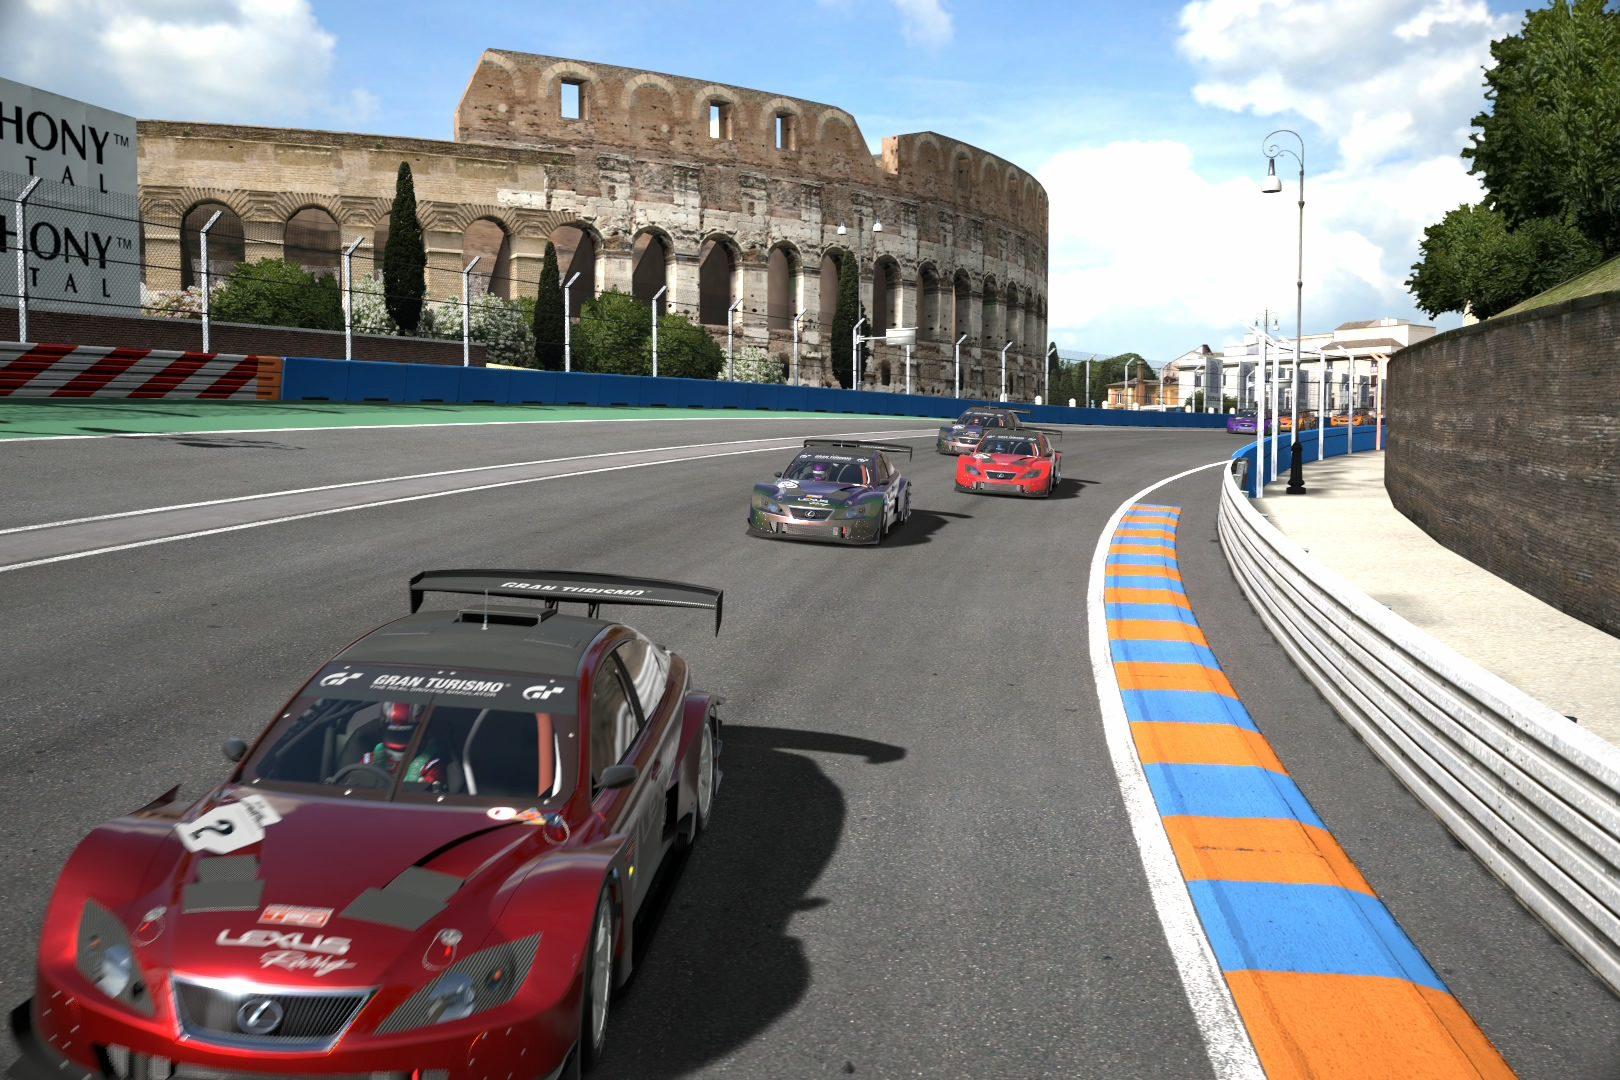 Circuito di Roma_4.jpg